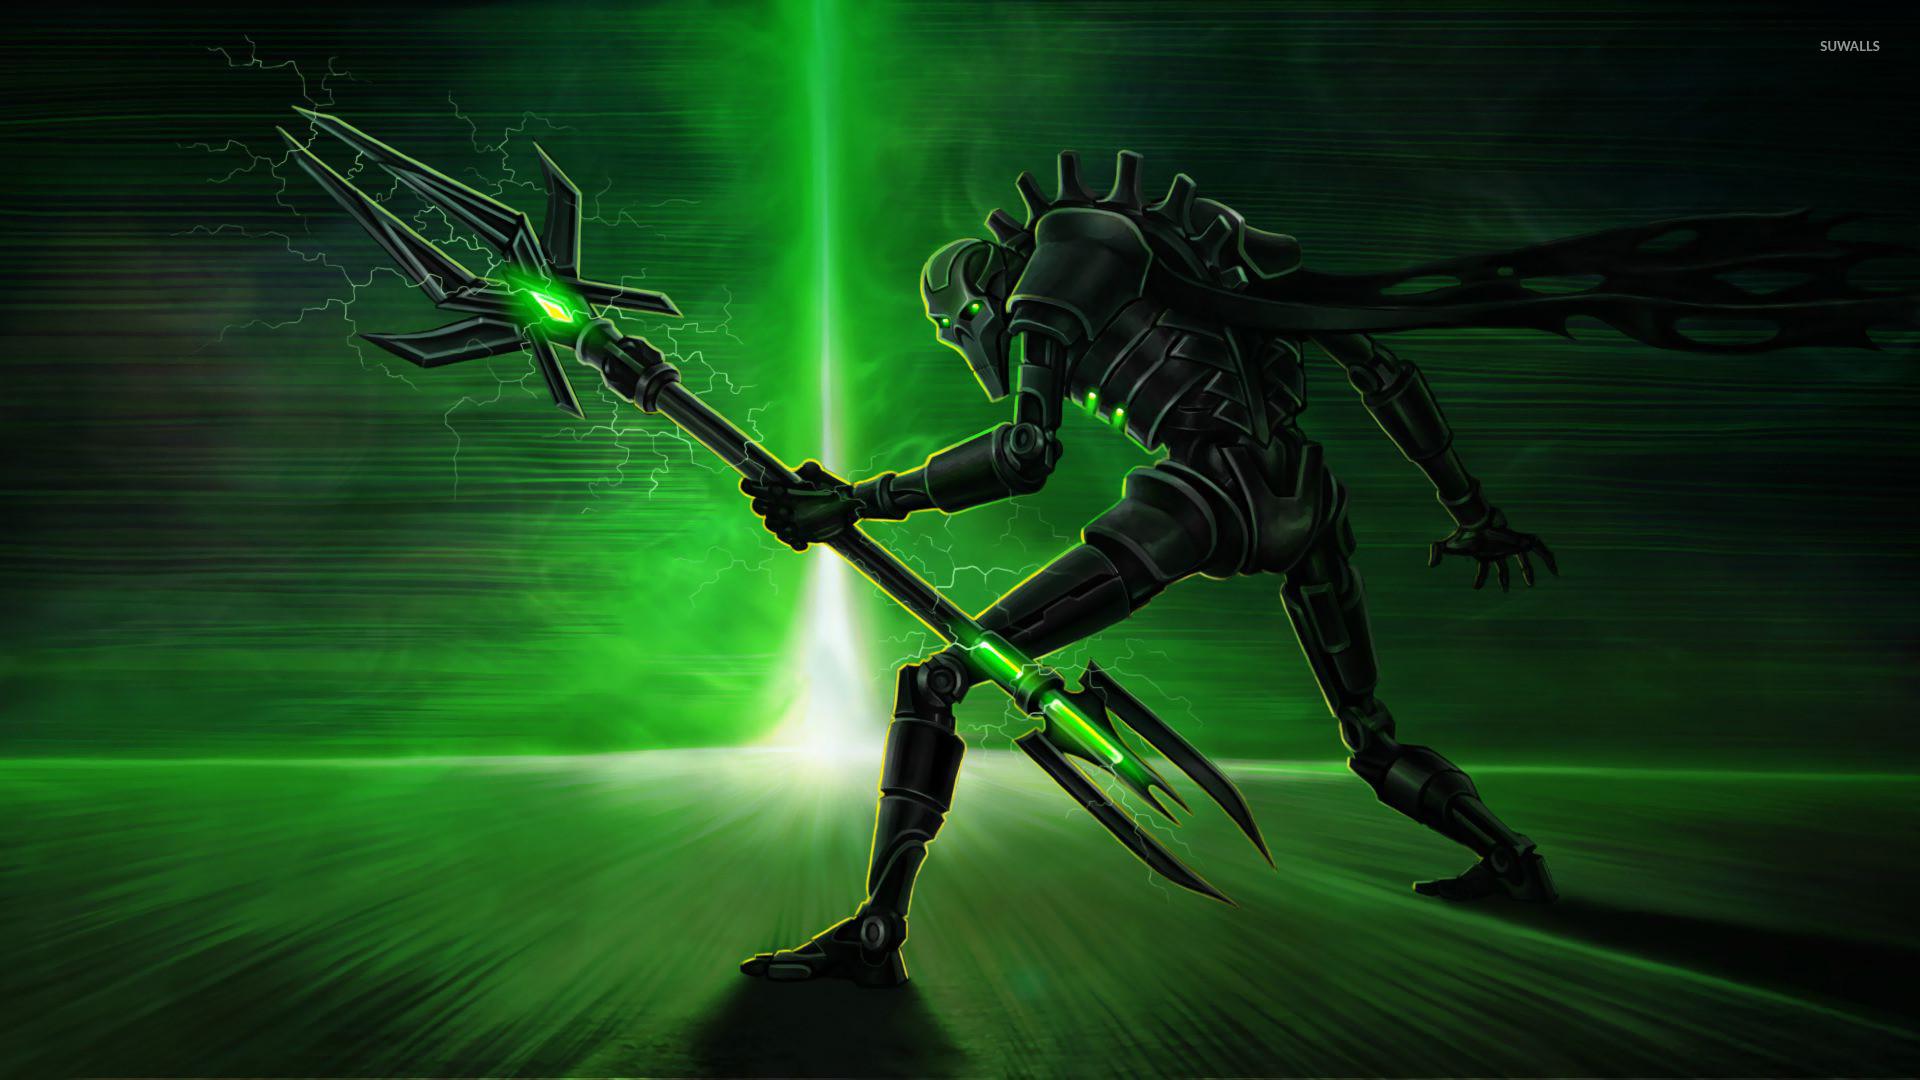 Warhammer 40,000: Space Marine [5] wallpaper jpg